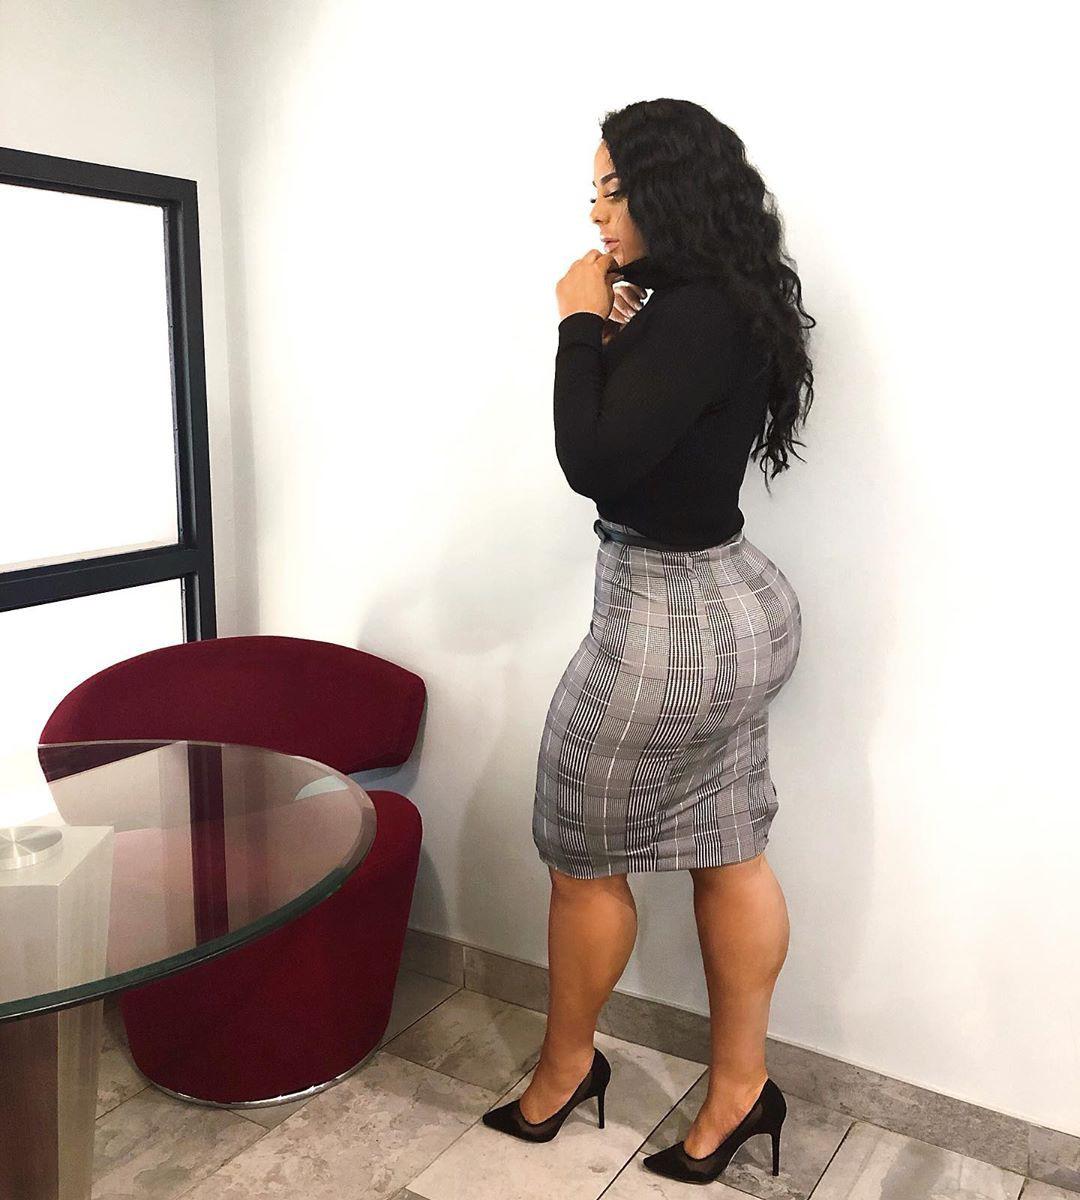 Gemstar dress pencil skirt lookbook fashion, hot legs picture